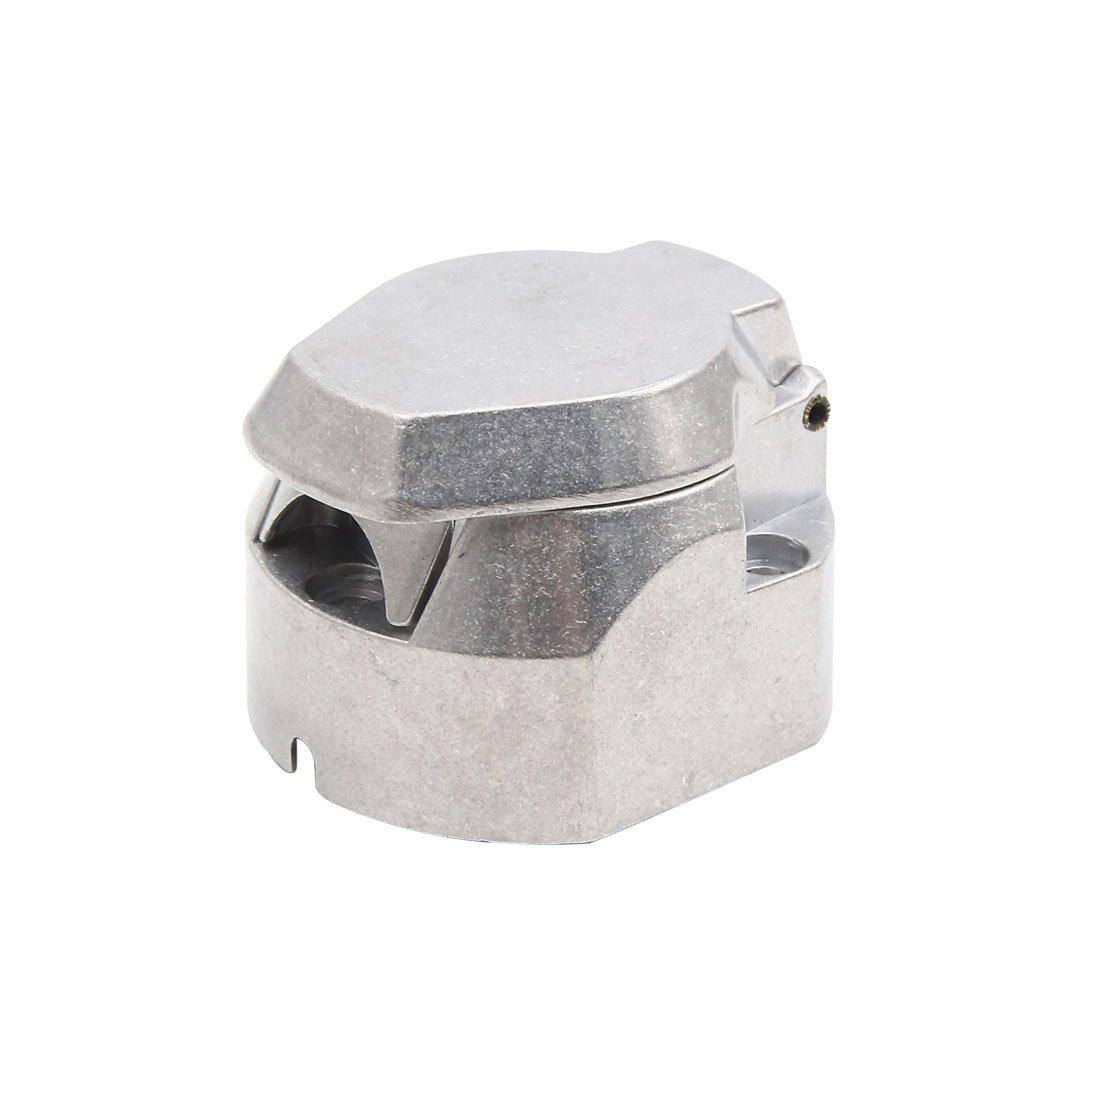 uxcell 13 Pin Flat Round Shape Aluminum Alloy Trailer Towbar Light Connector Adapter